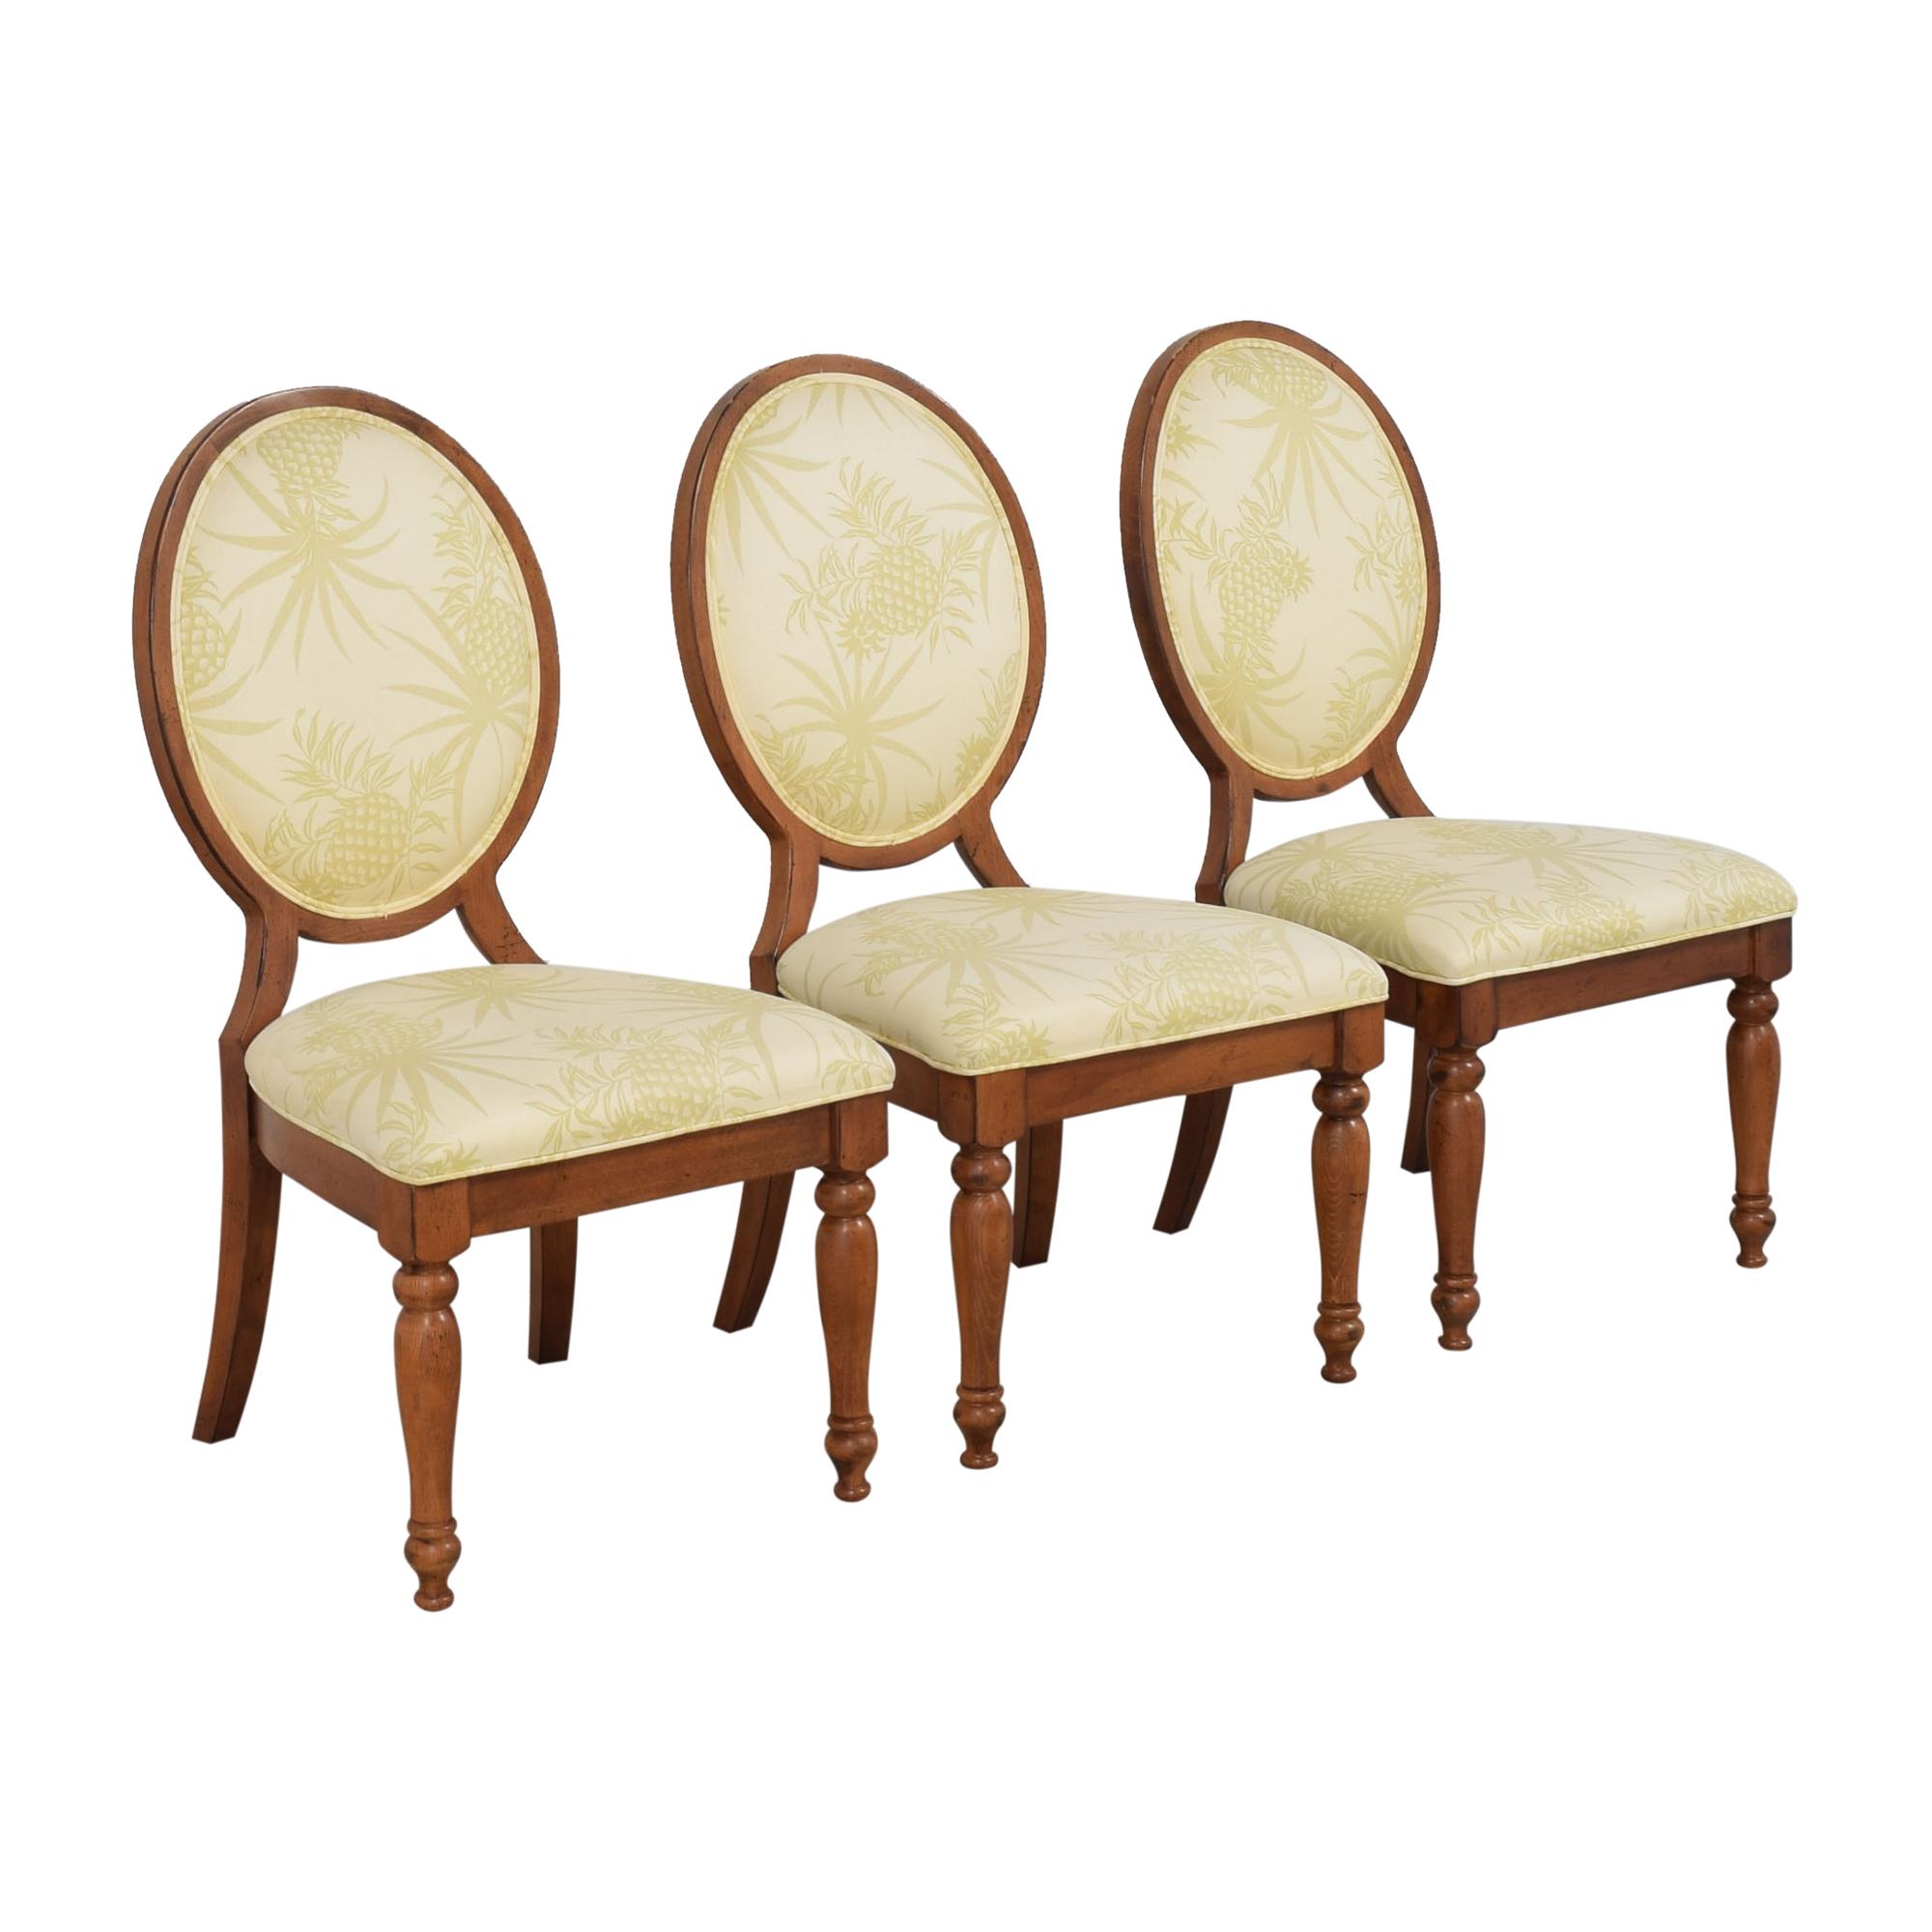 Lexington Furniture Lexington Furniture Oval Back Dining Chairs brown & beige